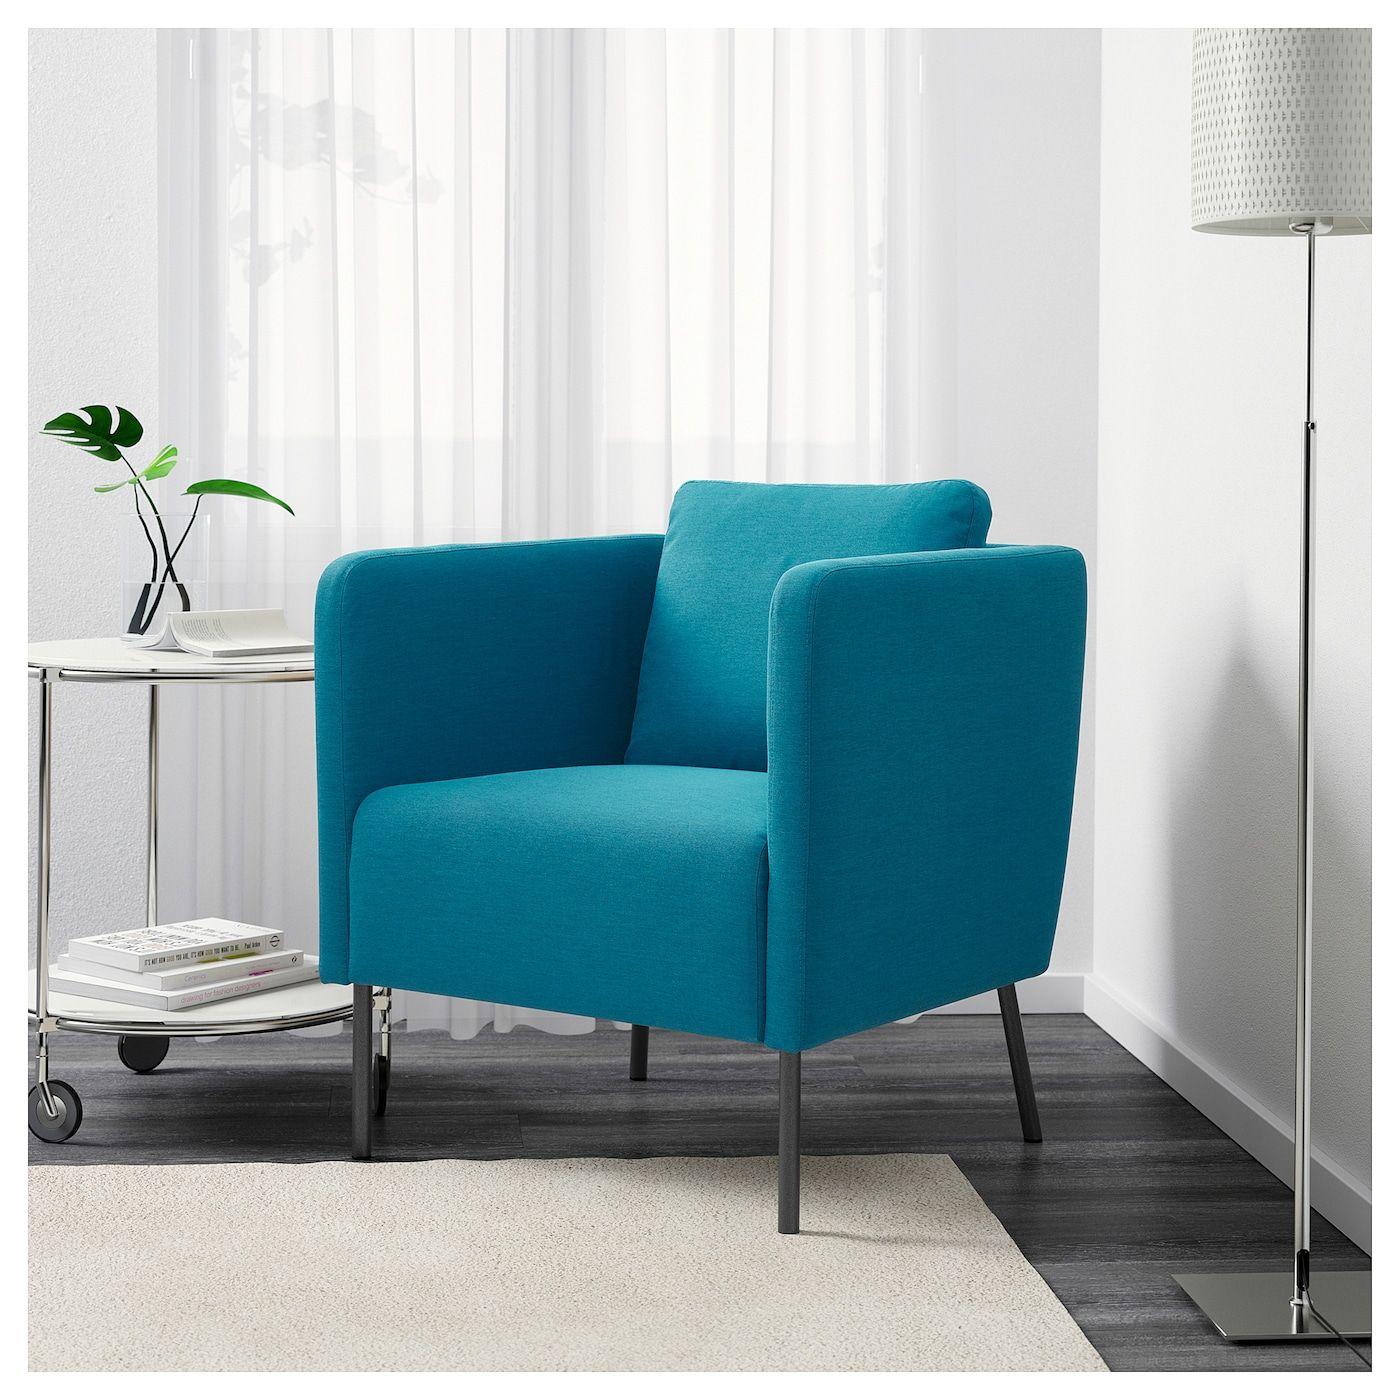 EKERÖ Sessel Knisa türkis IKEA Deutschland Haus deko